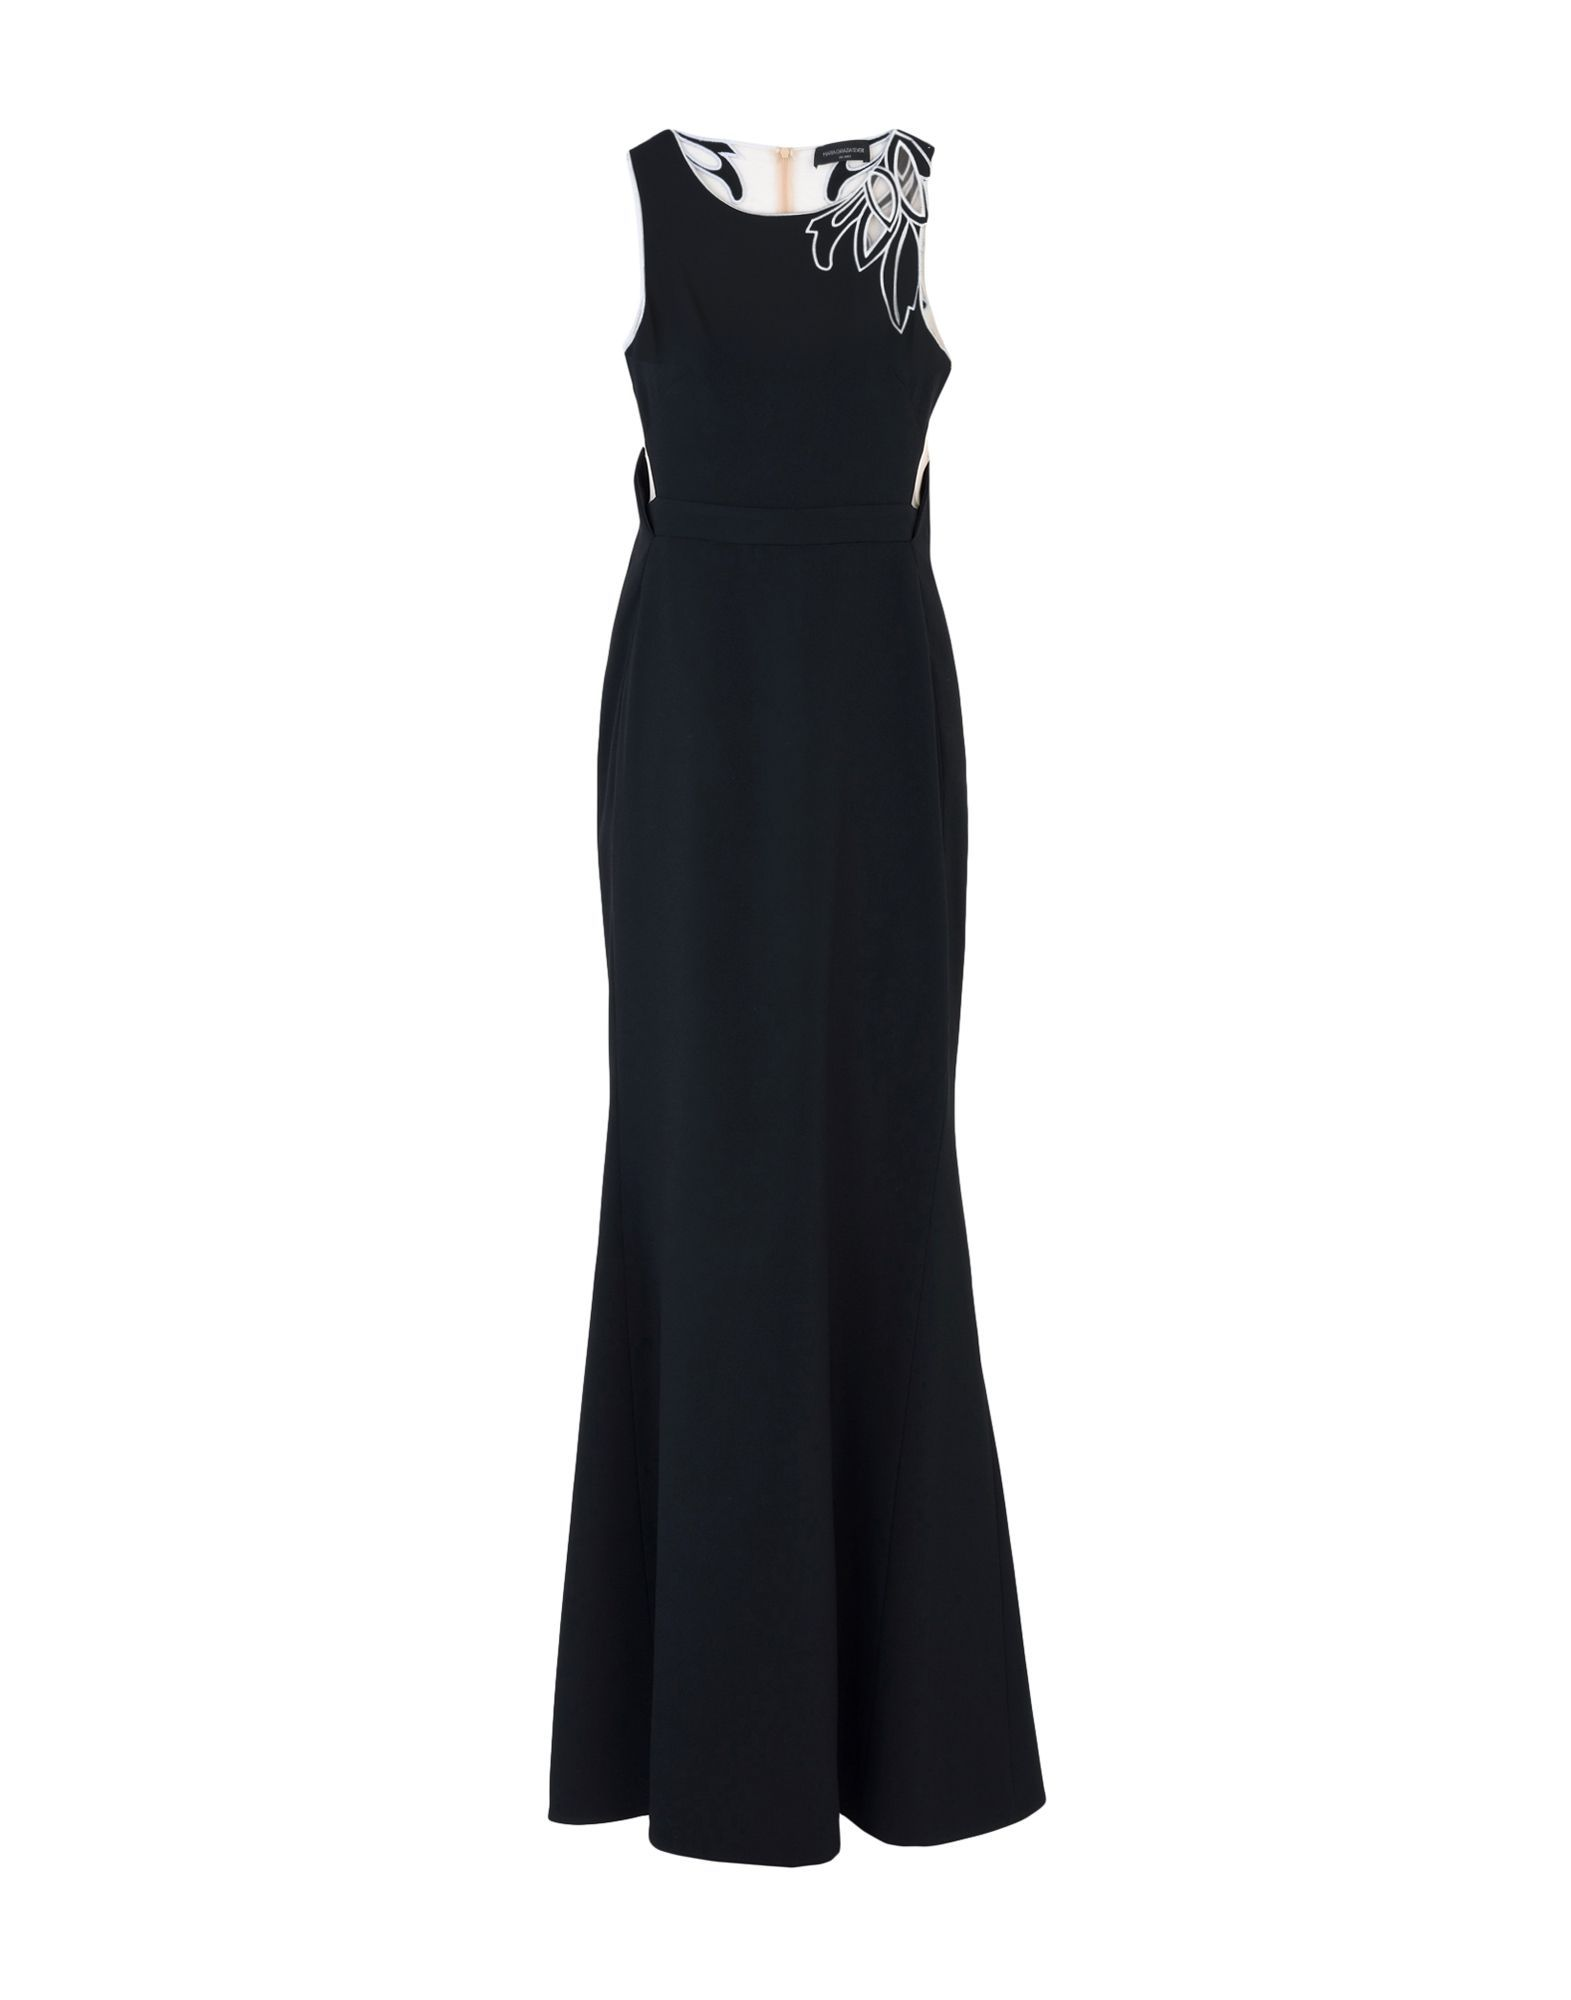 Maria Grazia Severi Black Full Length Dress